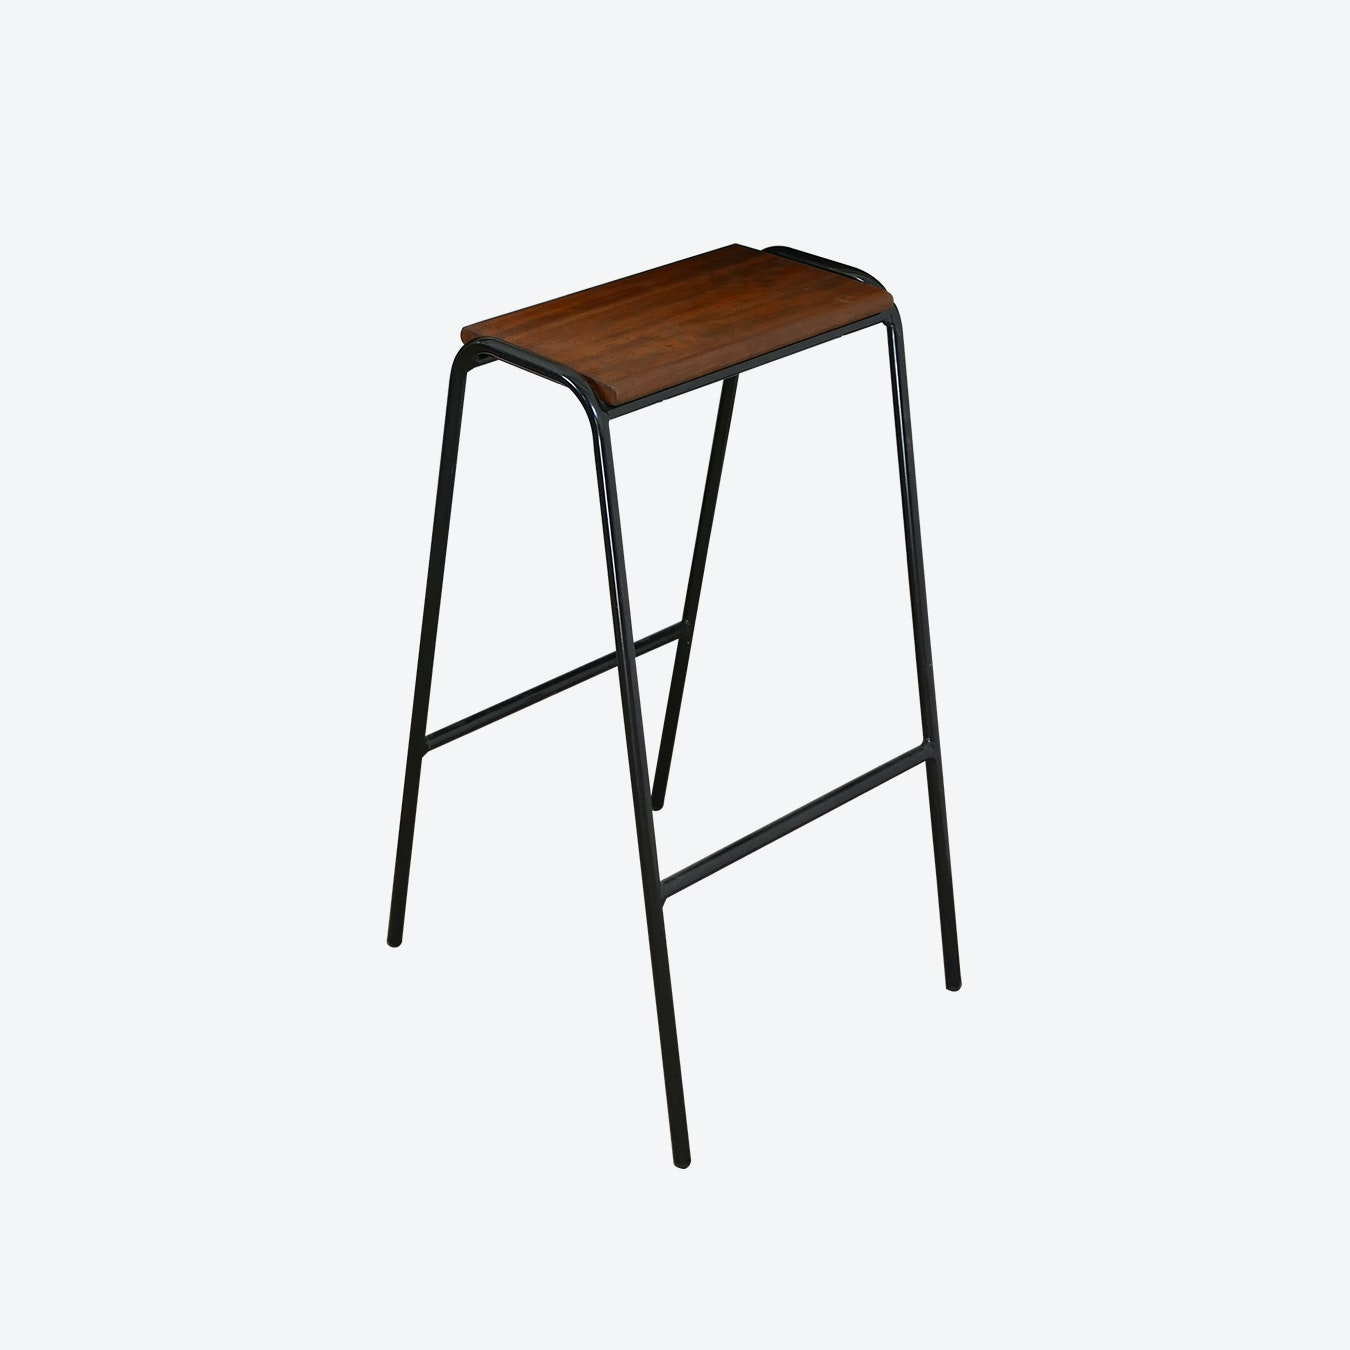 Awesome Pill Stool In Black W Iroko Wood Seat Machost Co Dining Chair Design Ideas Machostcouk